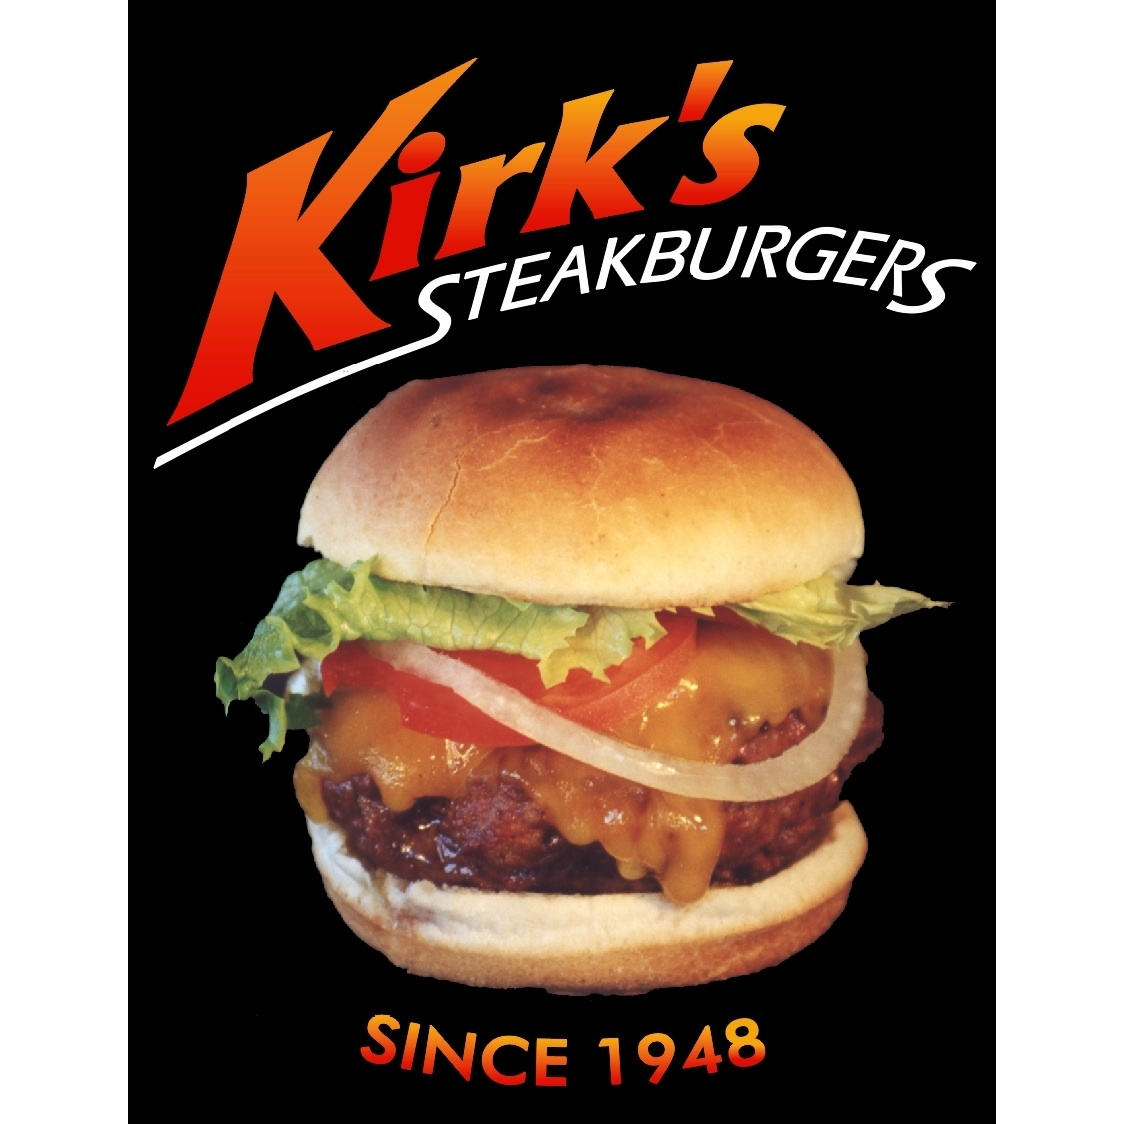 Kirks Steakburgers